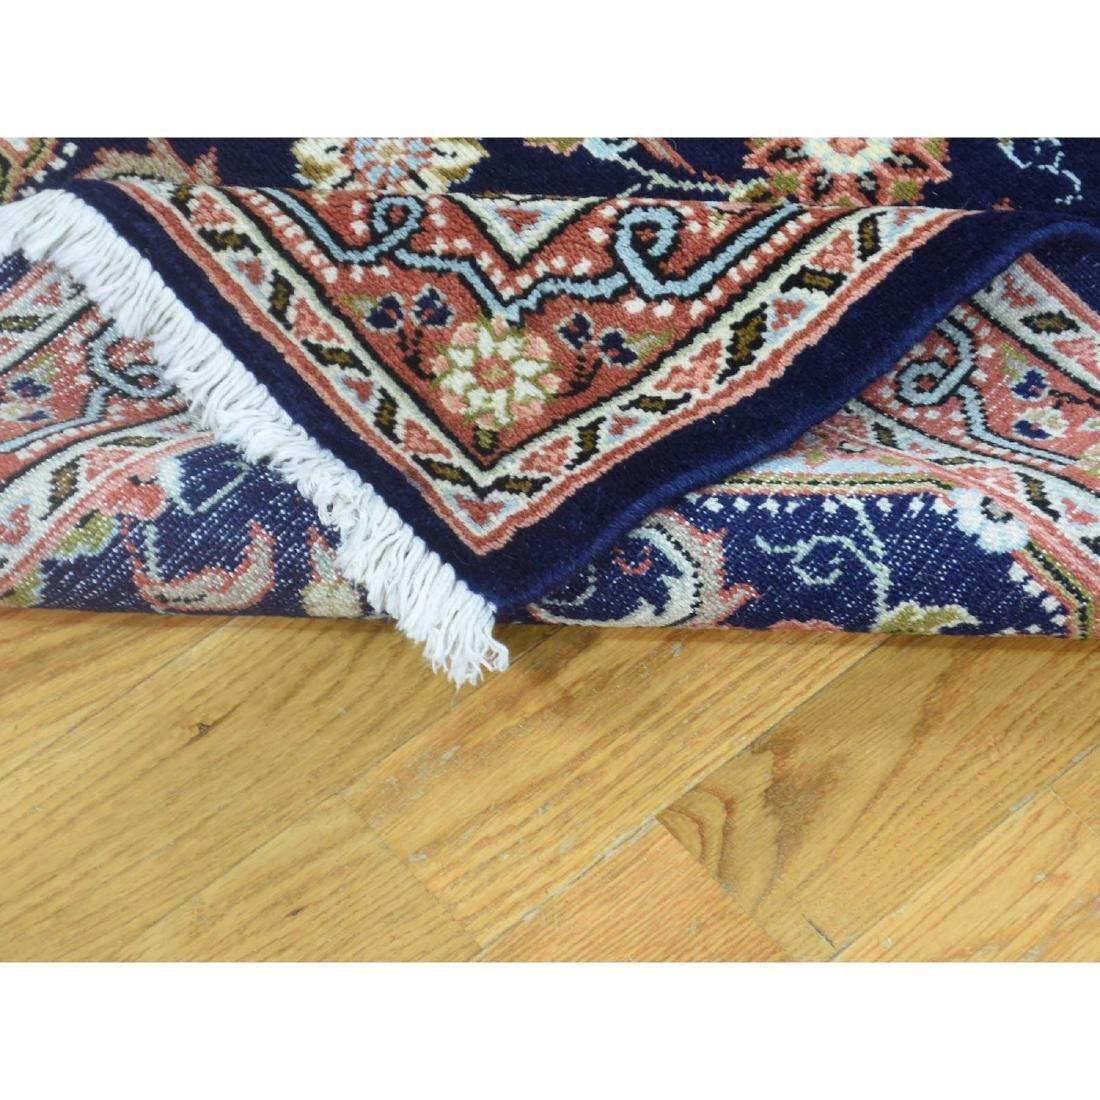 Handmade Persian Hamadan Runner Oriental Rug 2.8x10.2 - 8